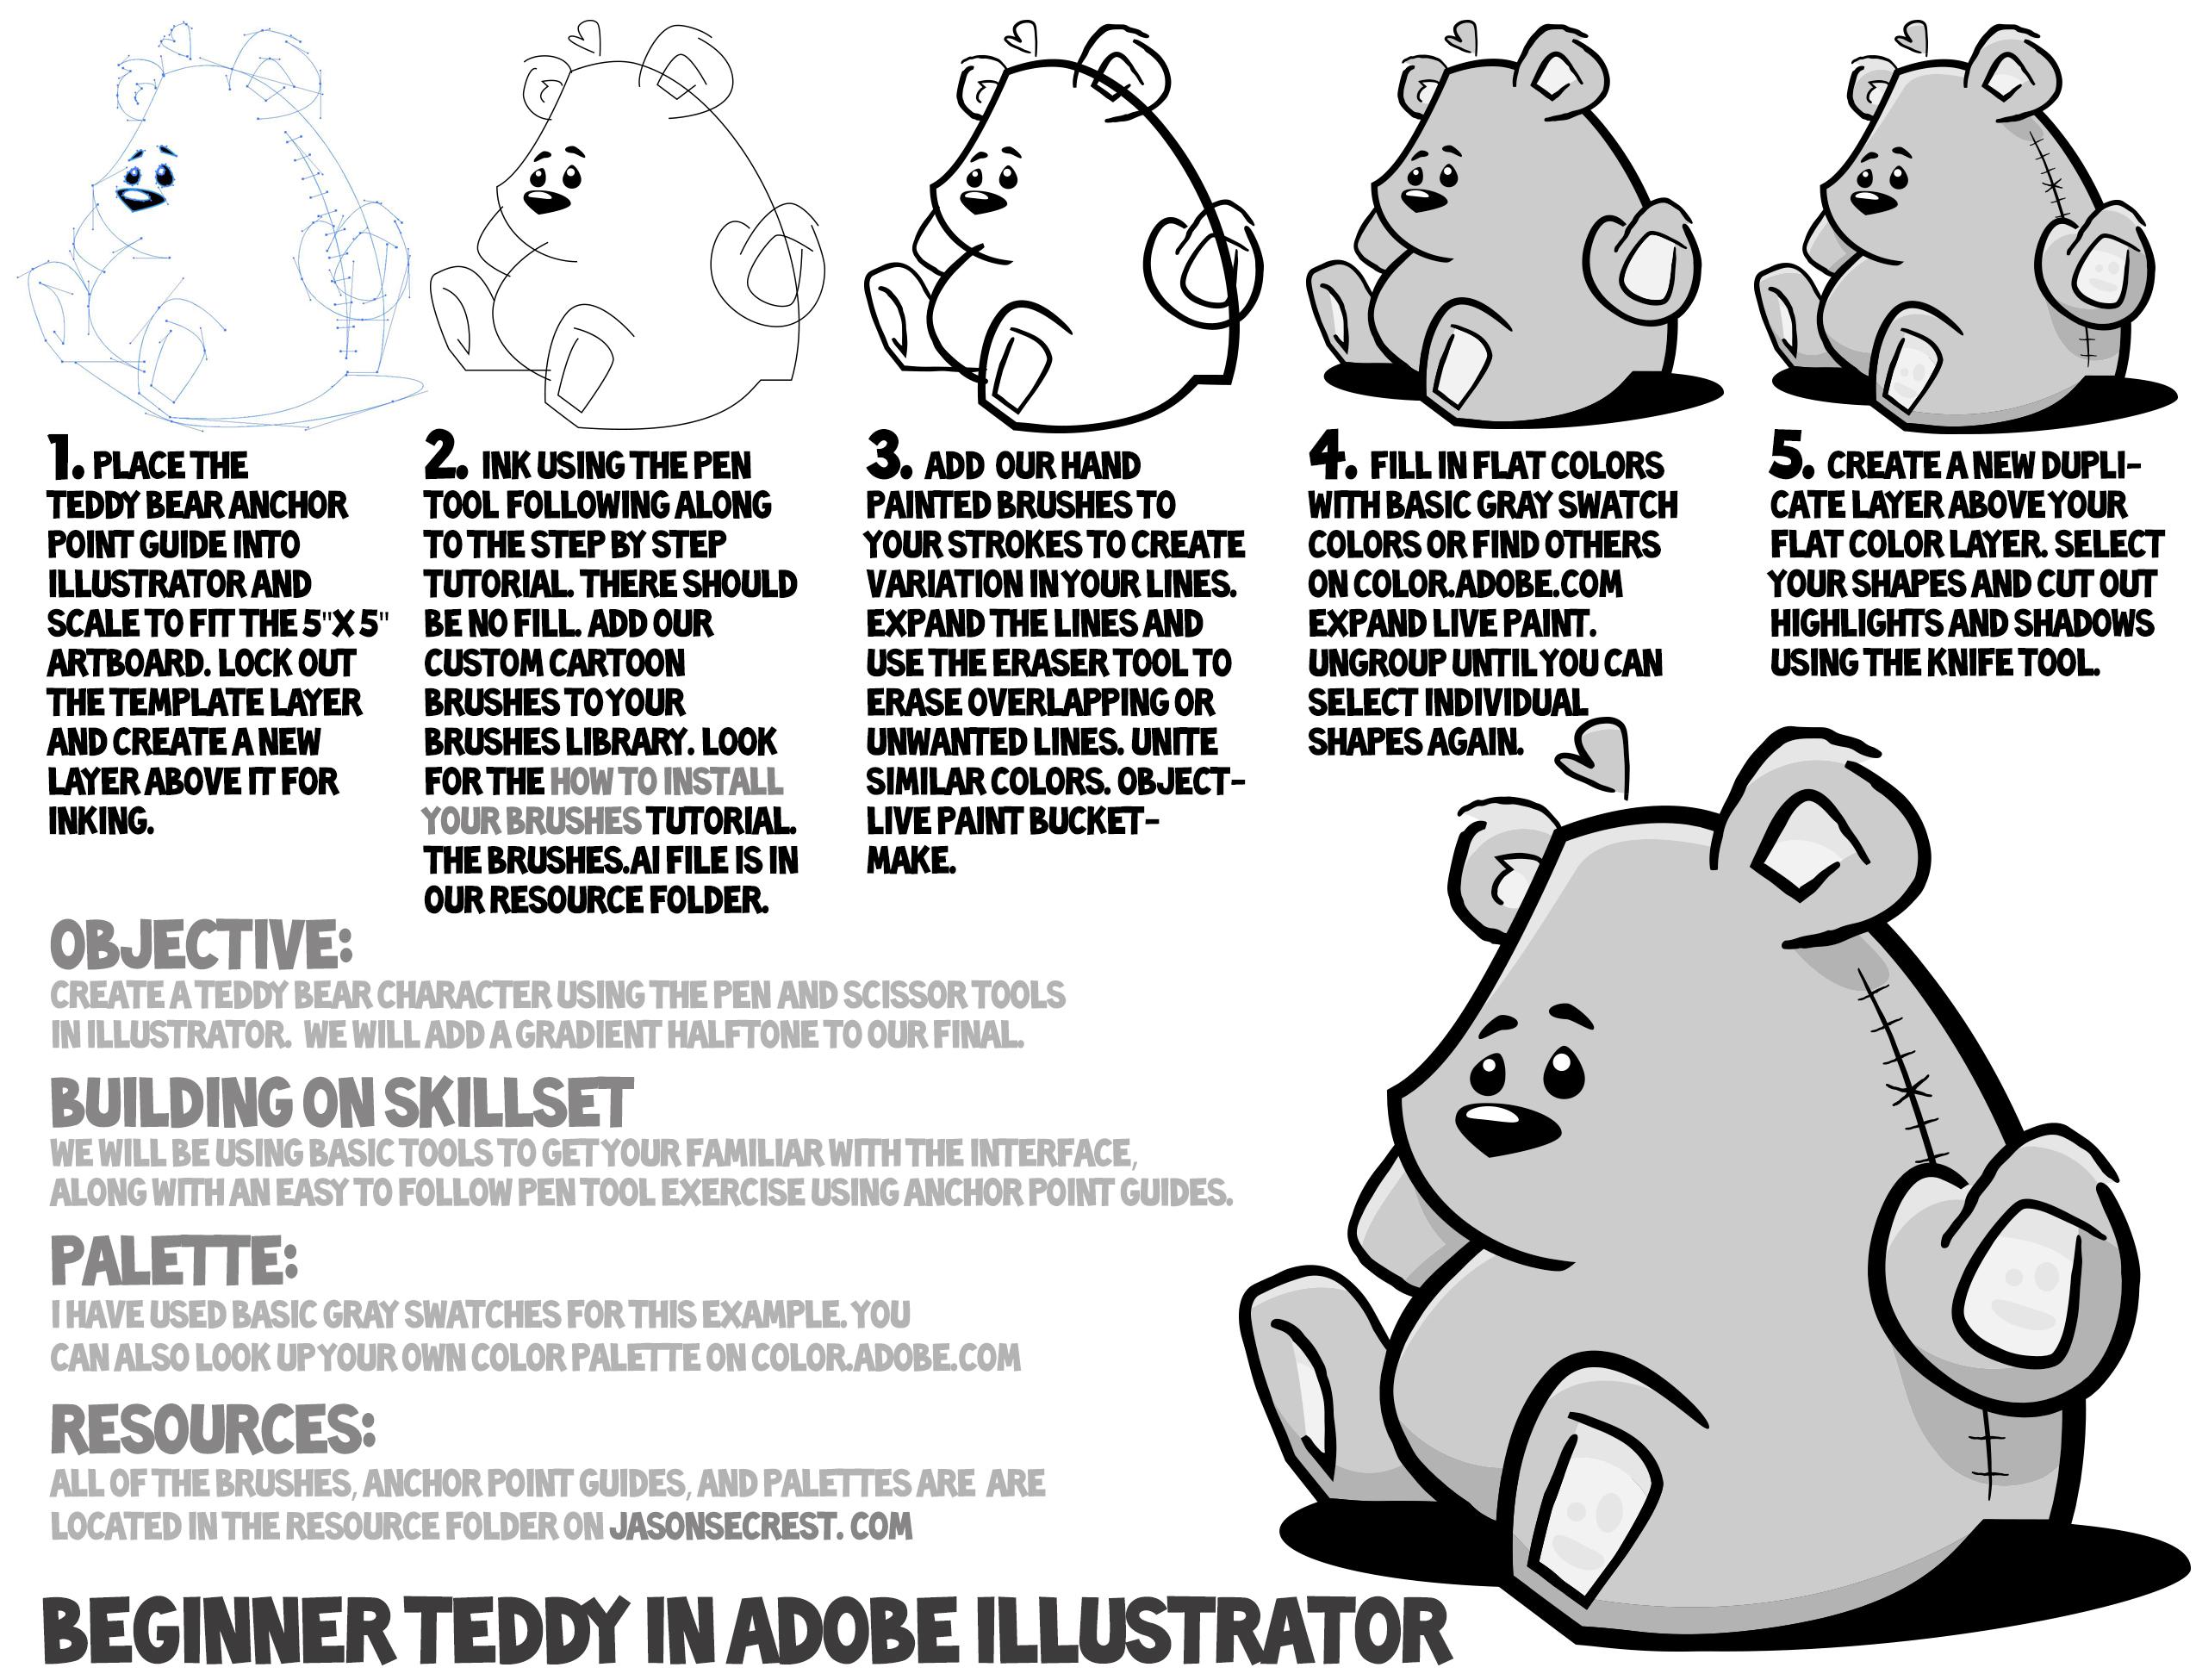 Adobe Illustrator Tutorial using Comic Strip Brushes